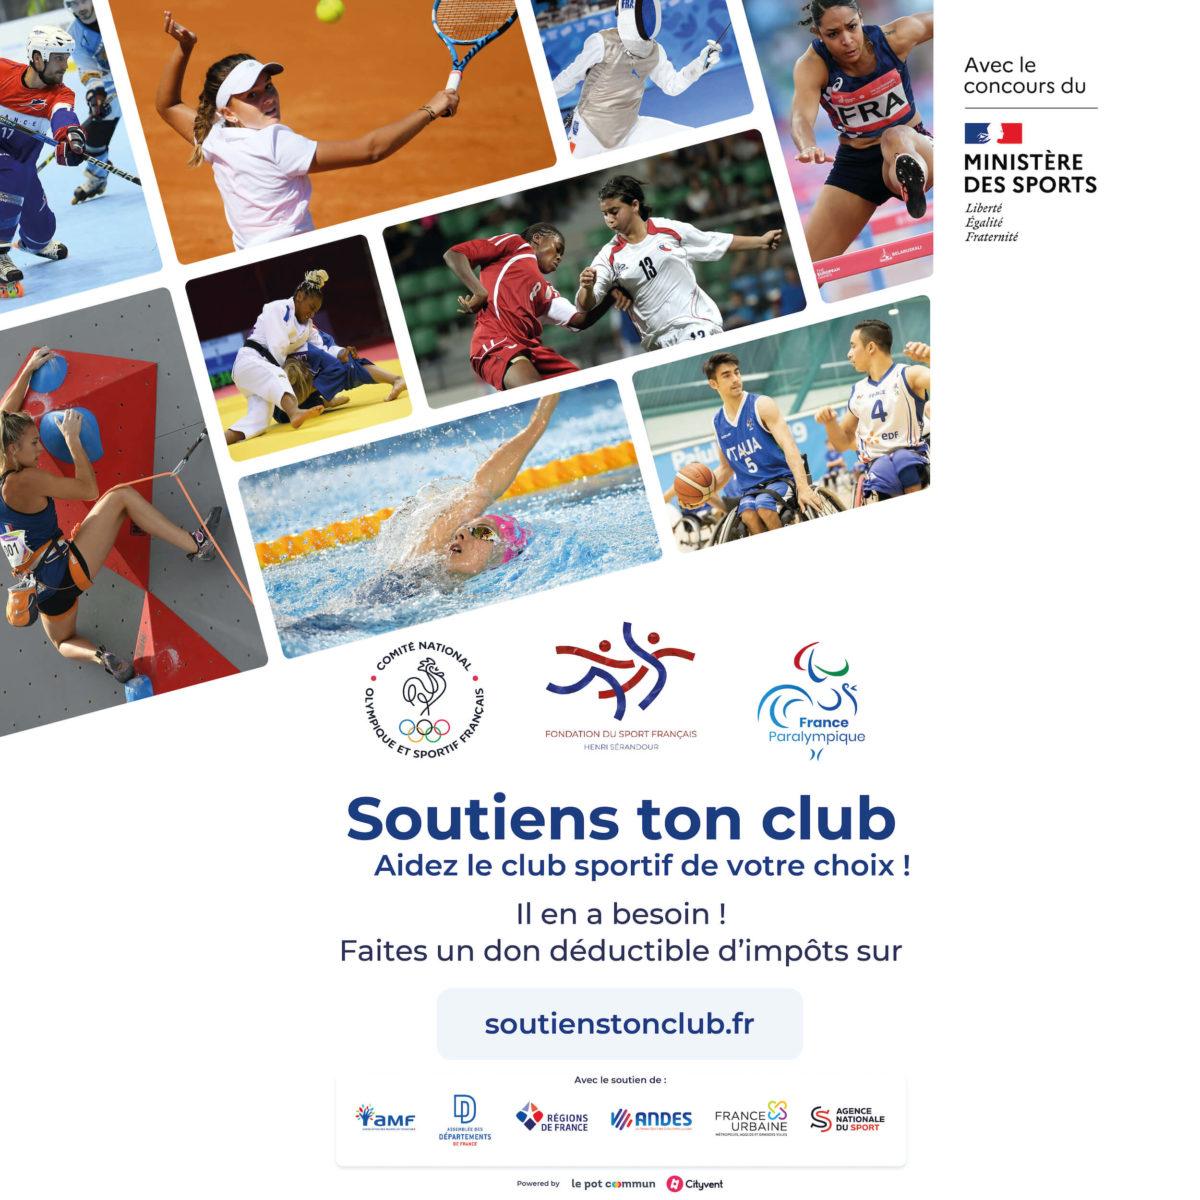 Soutiens ton club Astre Creillois Triathlon